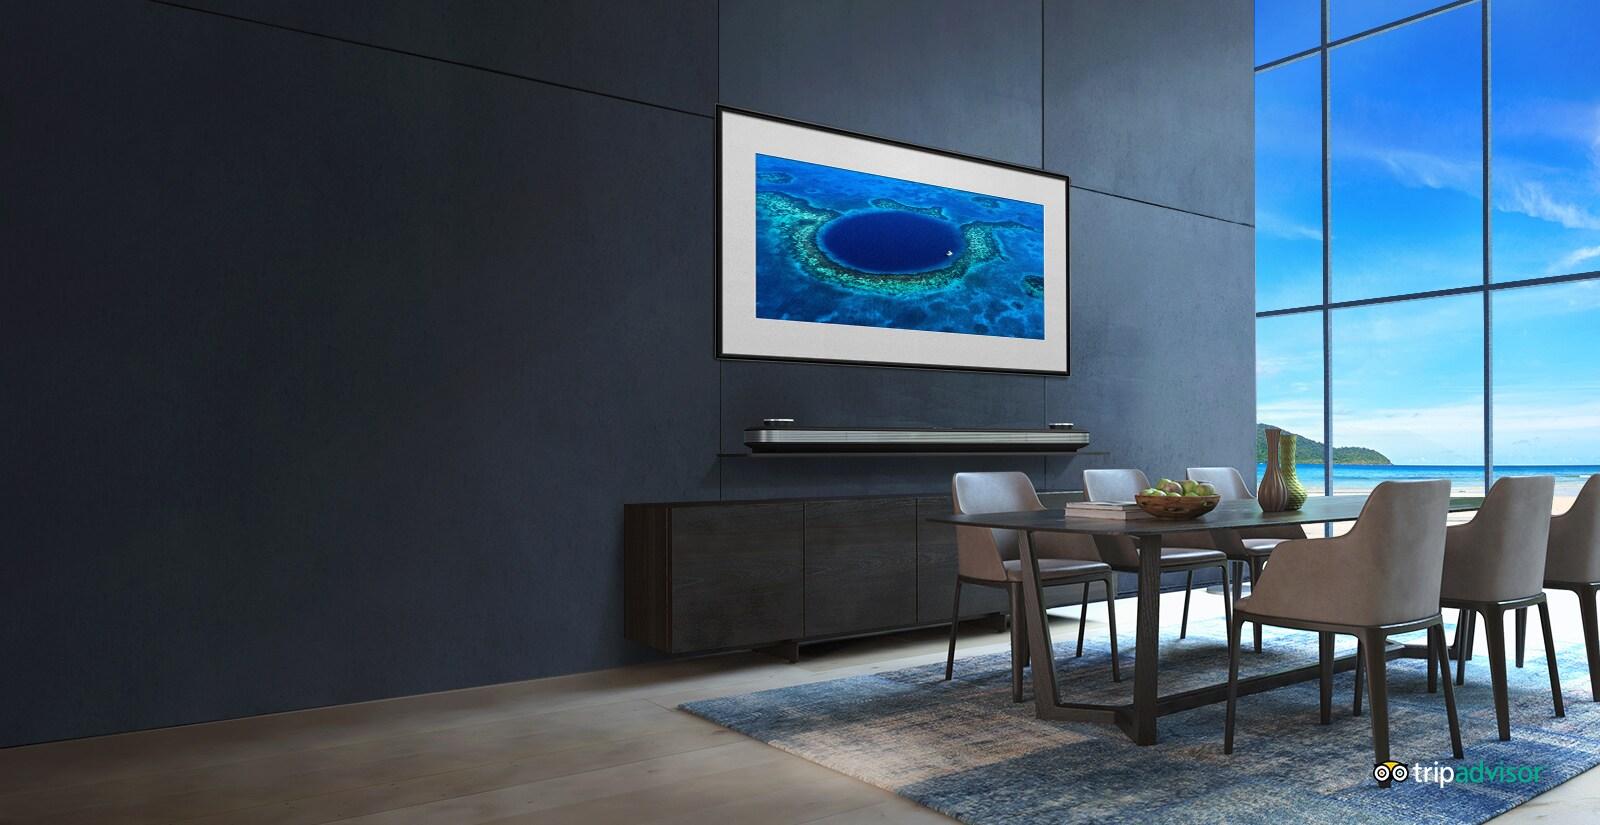 OLED TV โหมดแกลเลอรี